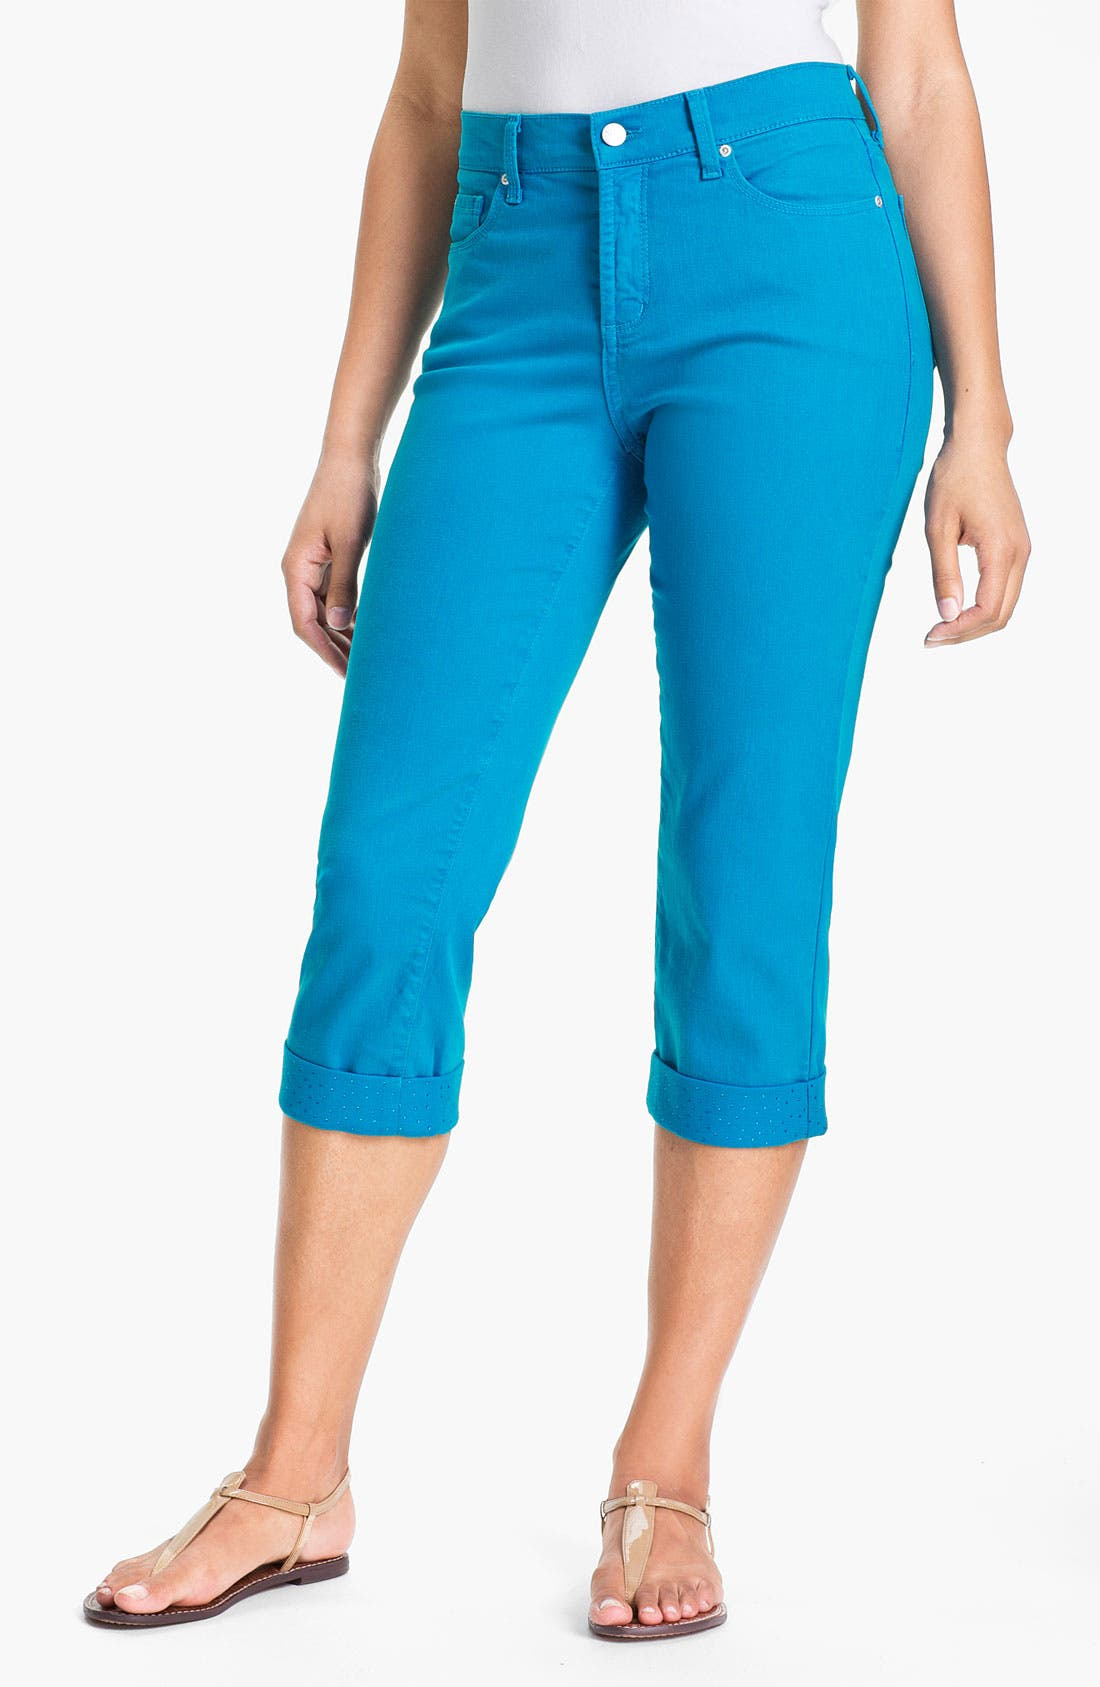 Alternate Image 1 Selected - NYDJ 'Alyssia' Embellished Crop Jeans